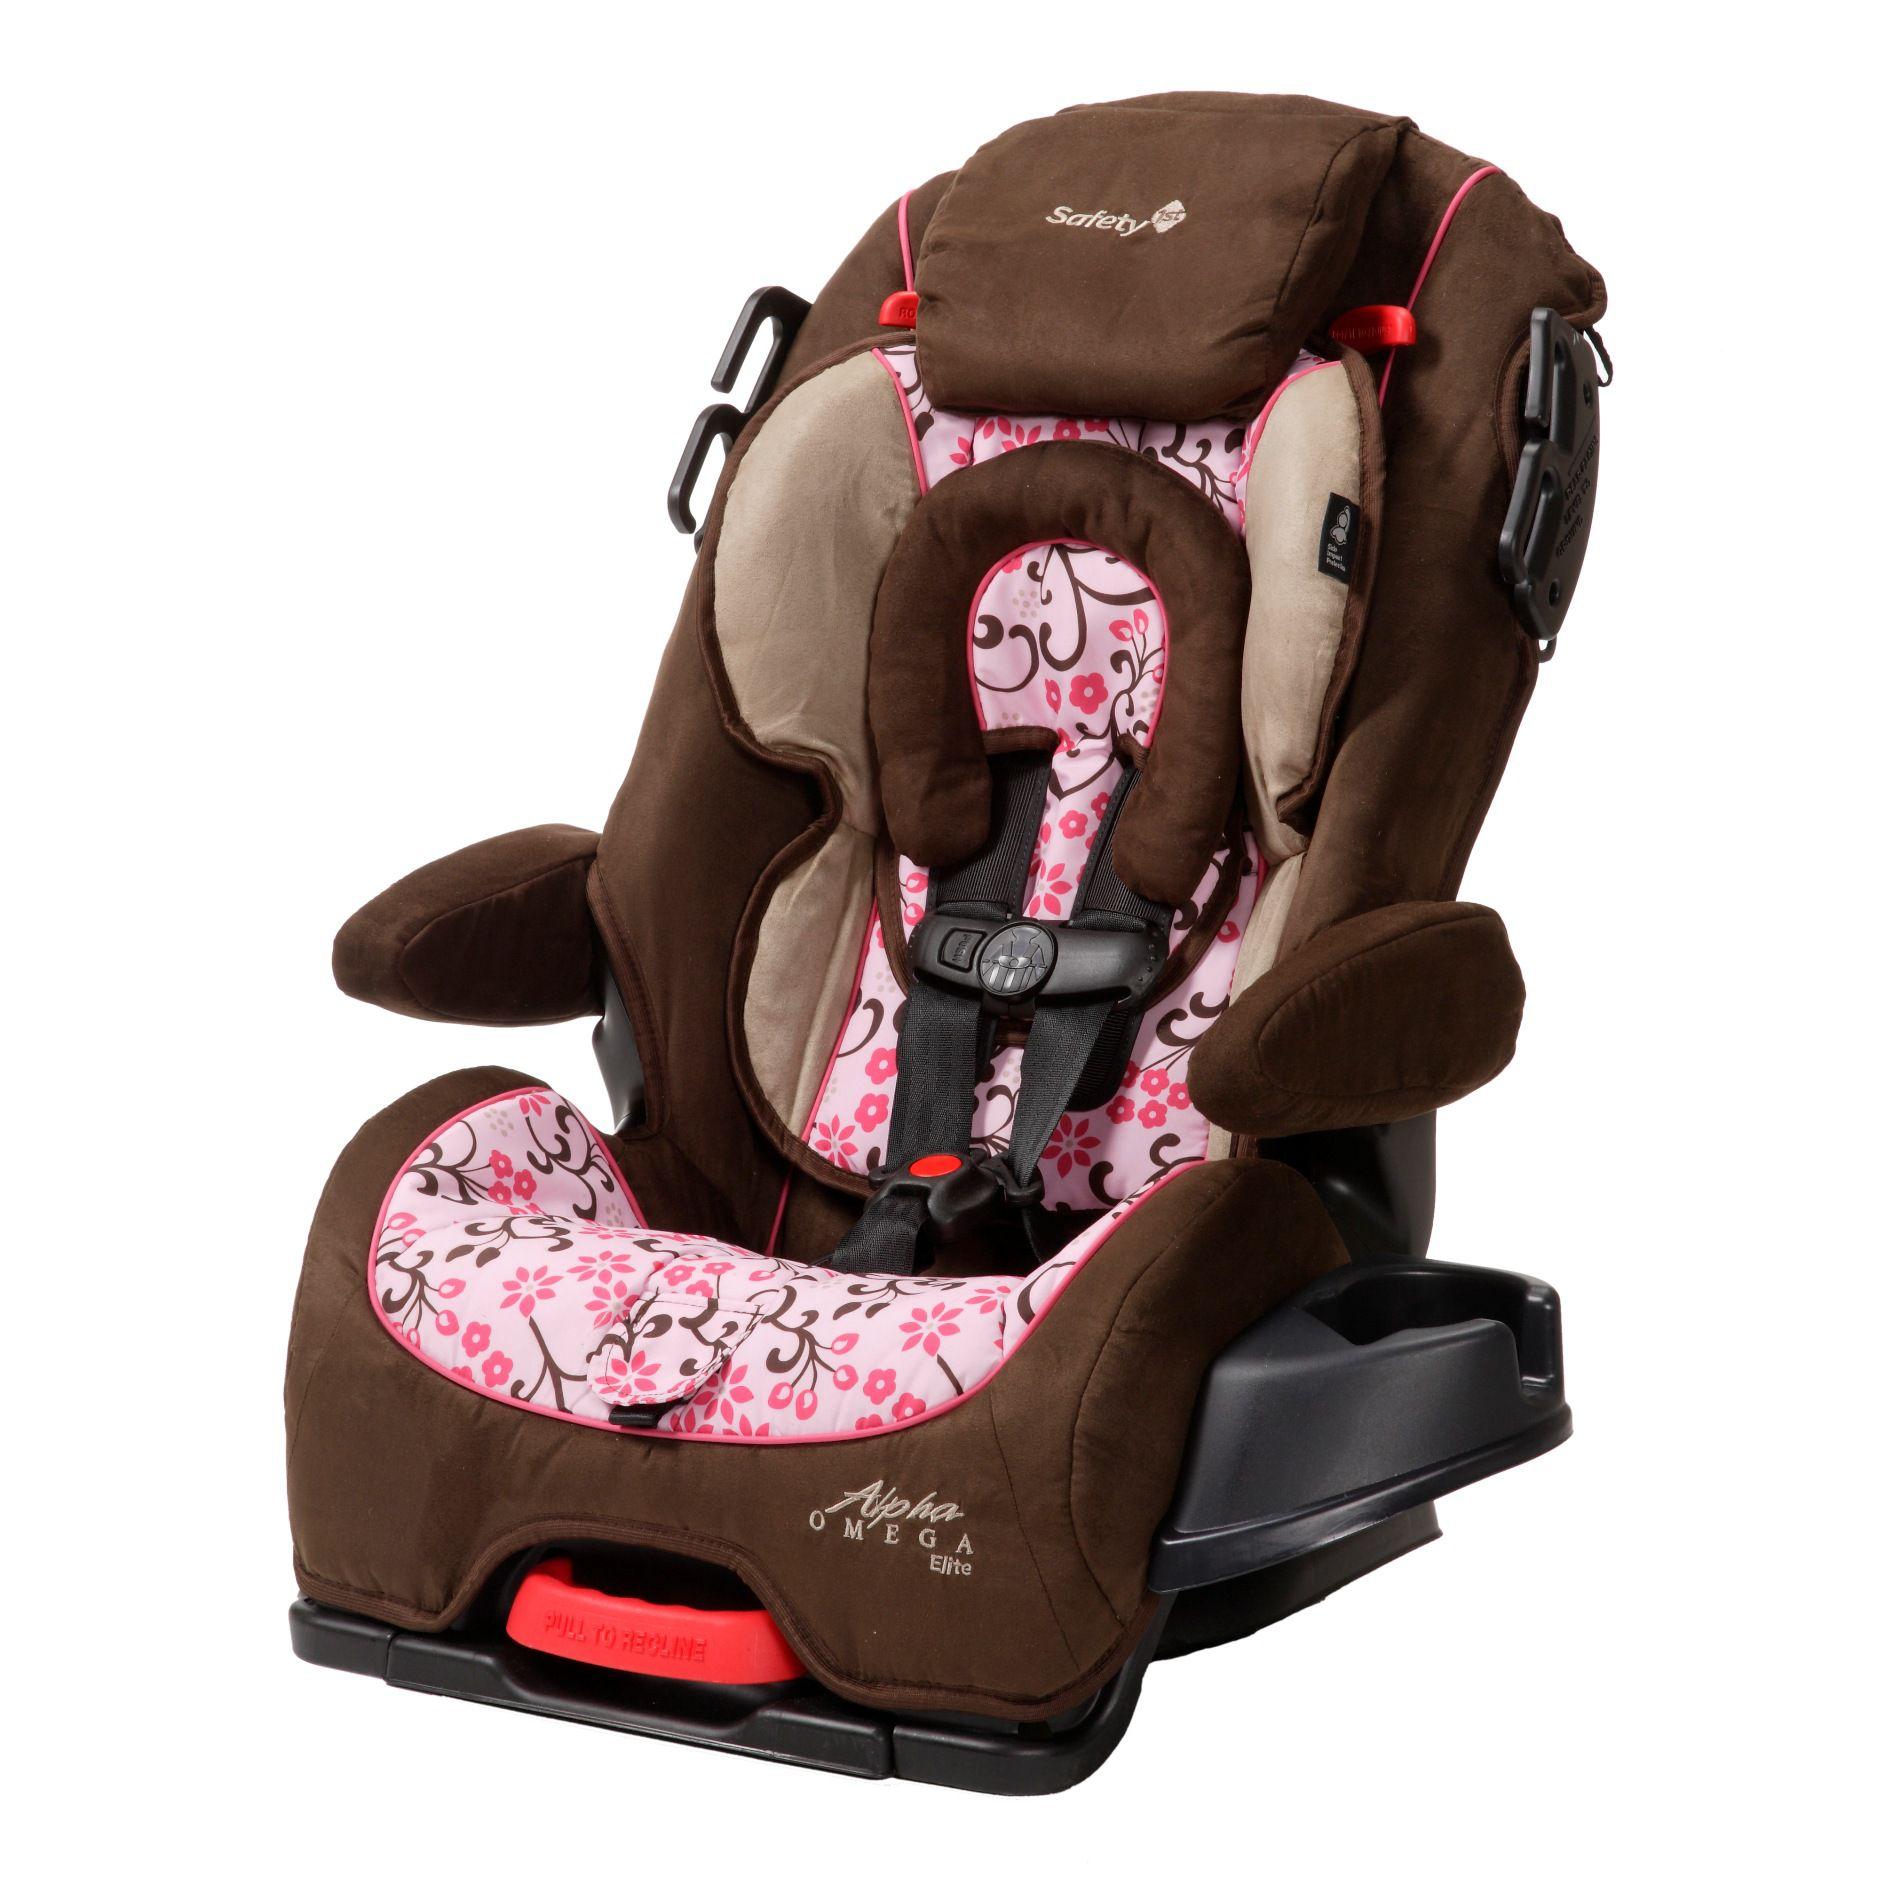 alpha omega elite car seat instructions